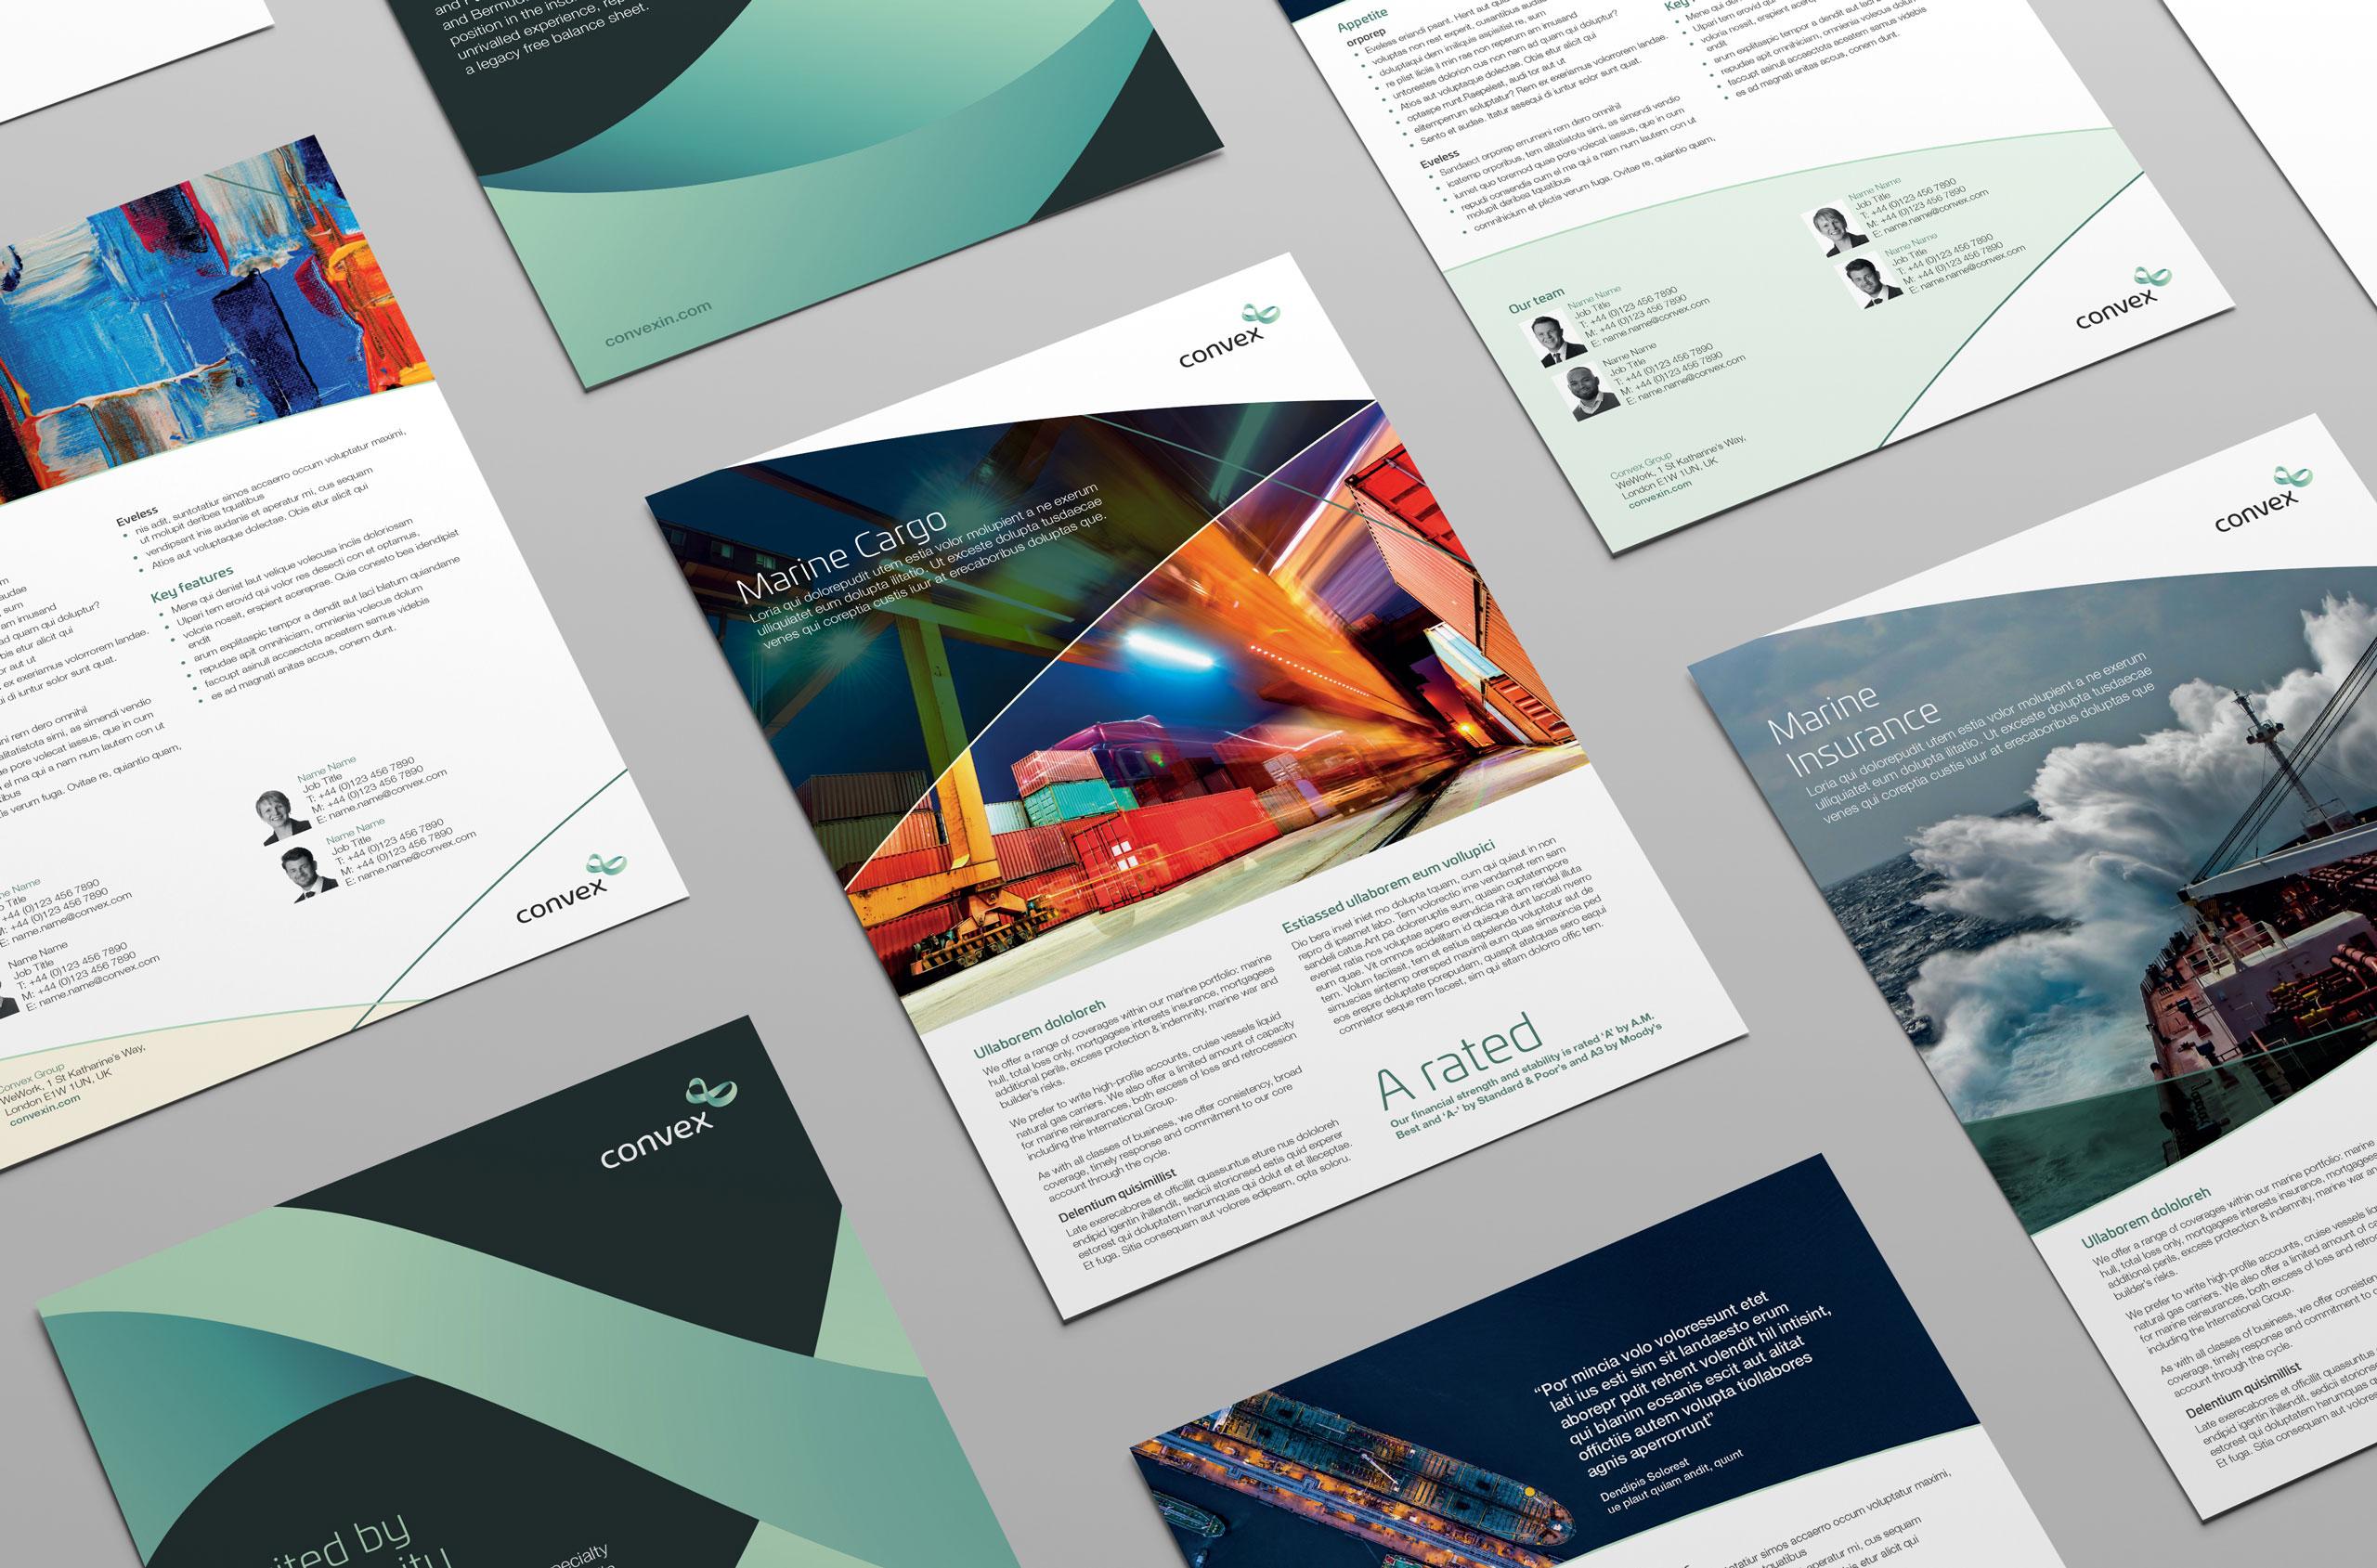 Glendale Creative Convex Factsheet Designs